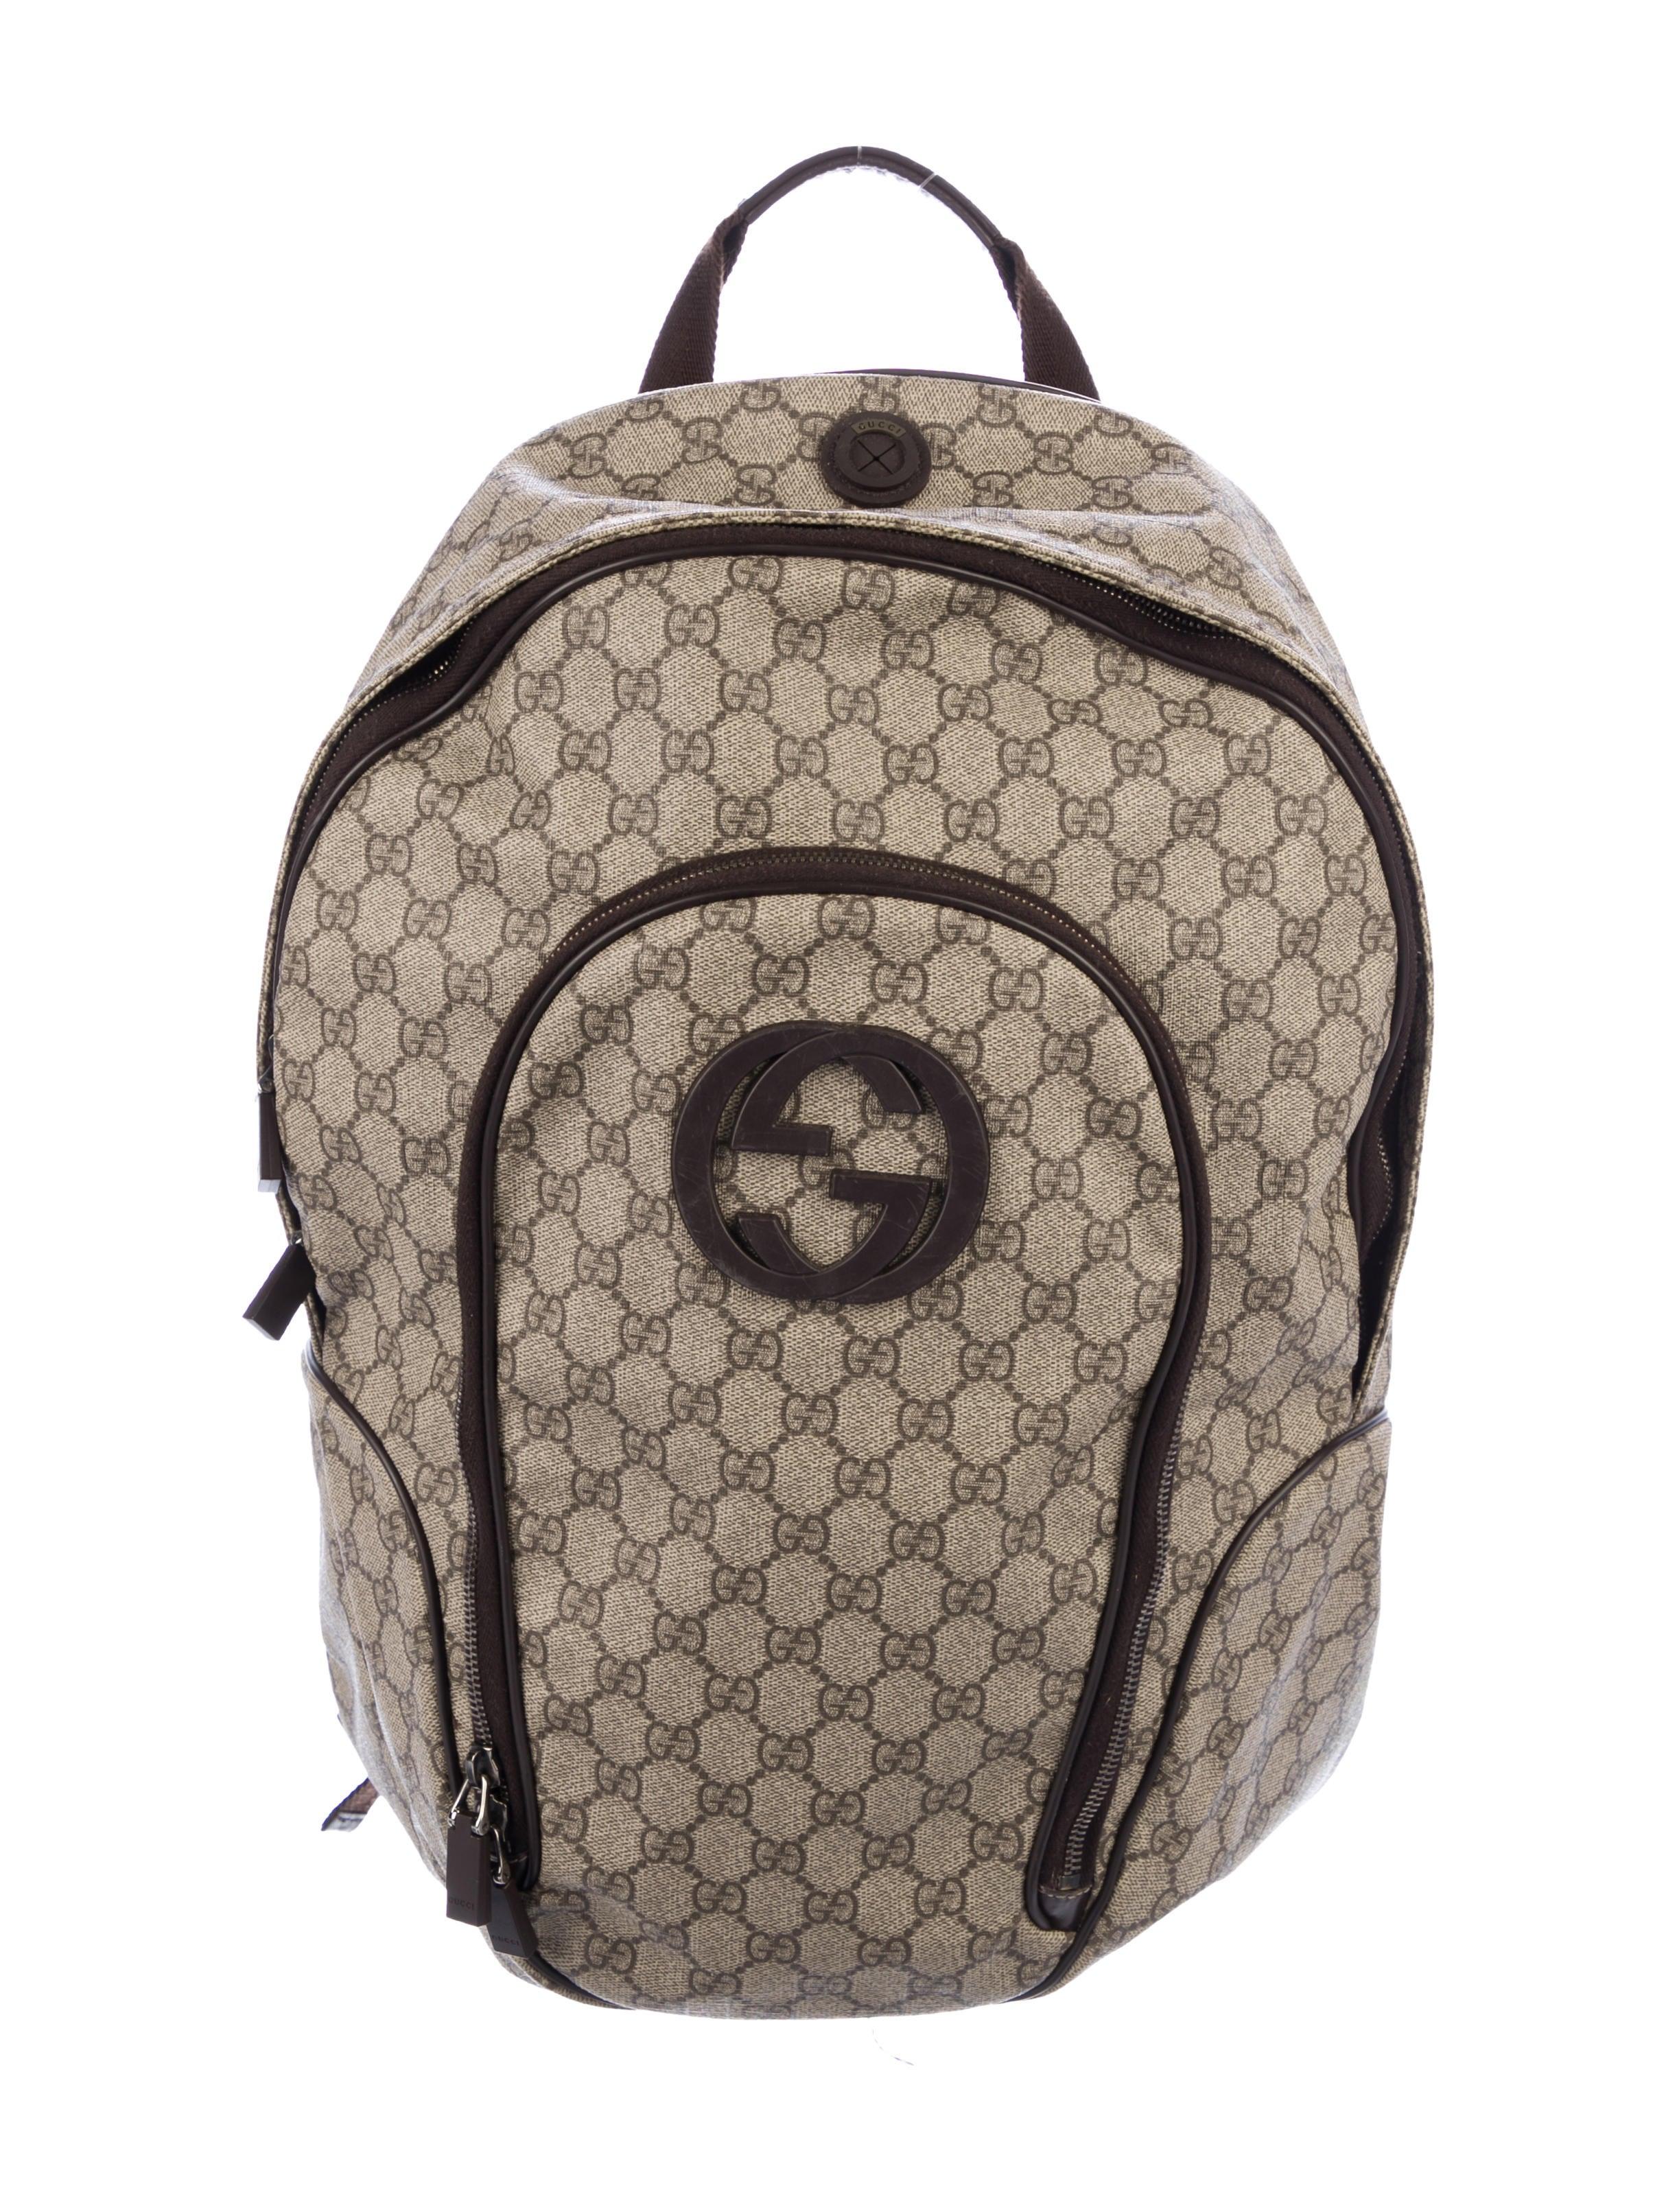 8ba0f393f9d8 Gg Supreme Canvas Interlocking G Backpack Black